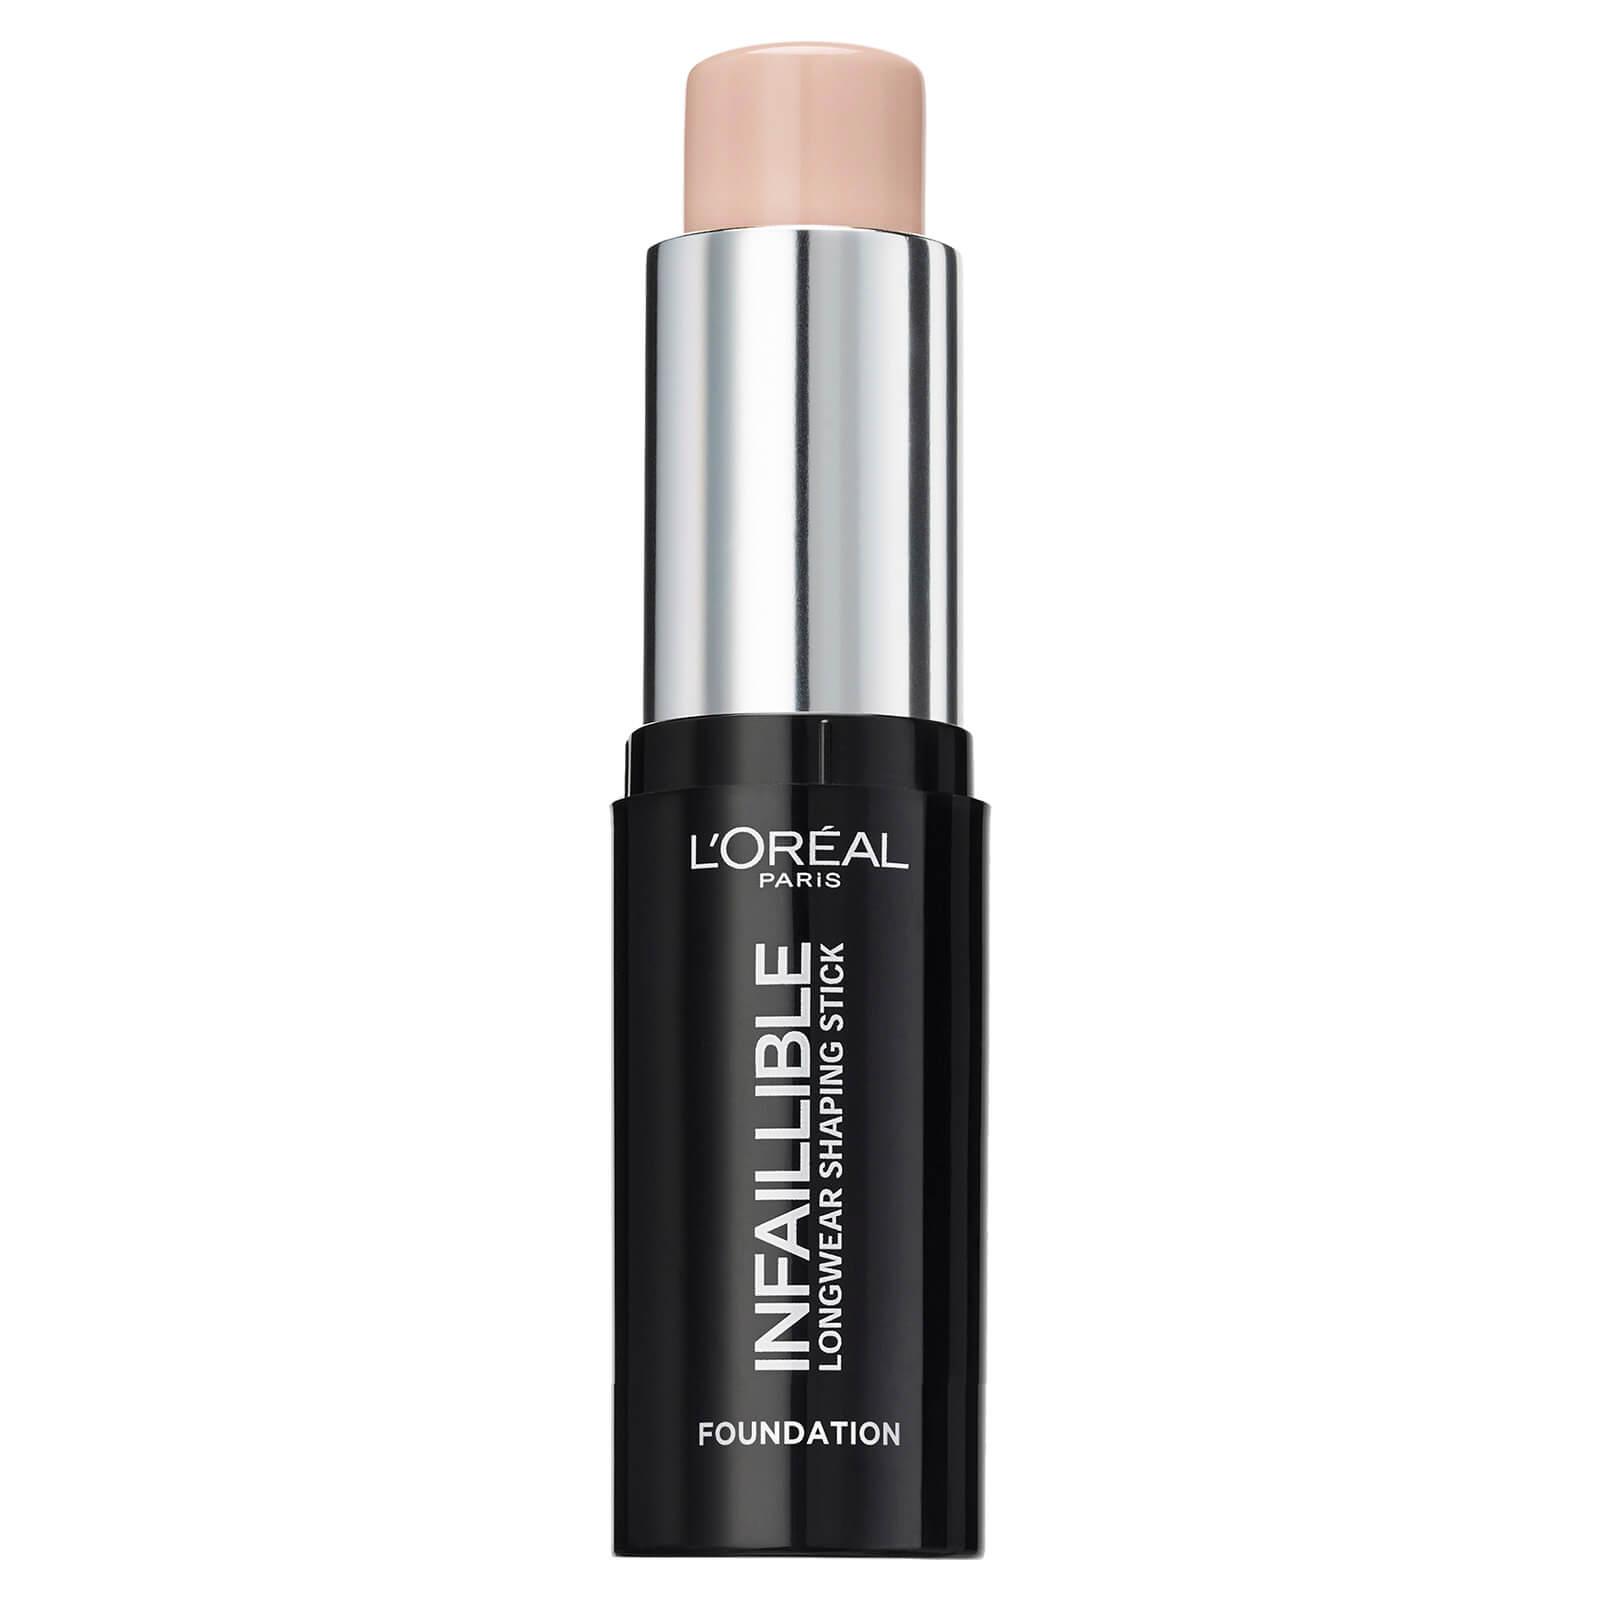 Купить L'Oréal Paris Infallible Shaping Stick Foundation 9g (Various Shades) - 150 Beige Rose